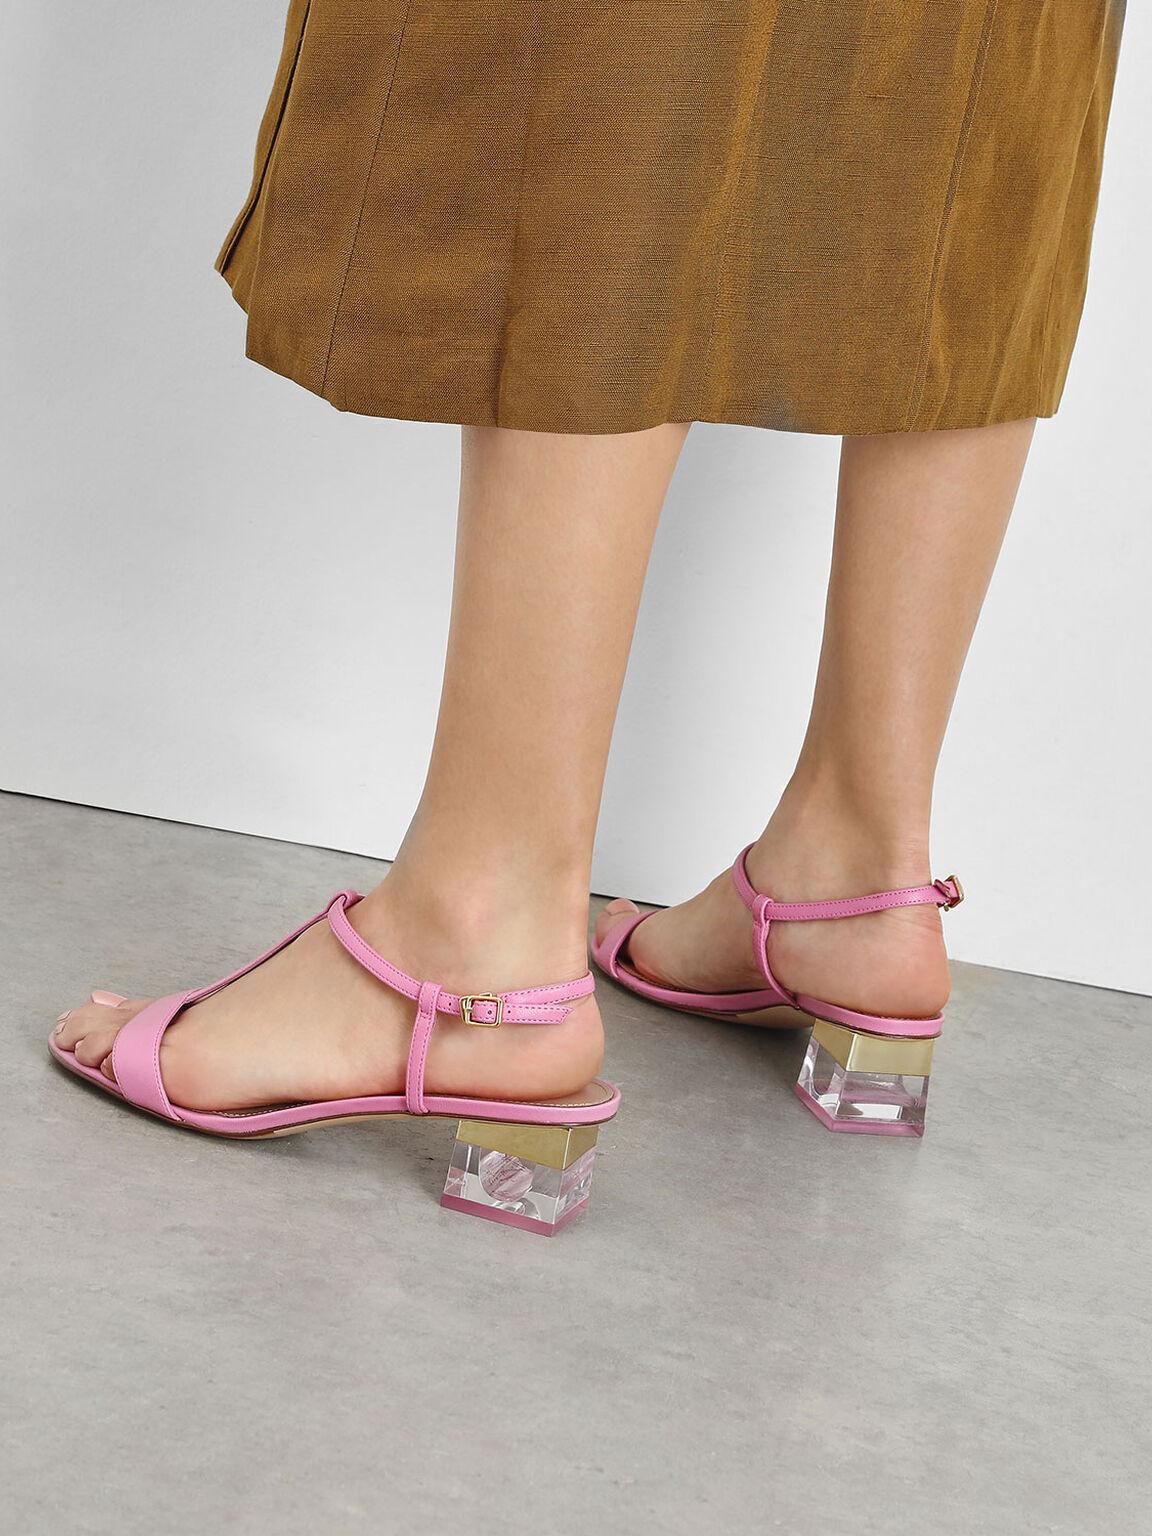 T-Bar Lucite Heel Sandals, Pink, hi-res